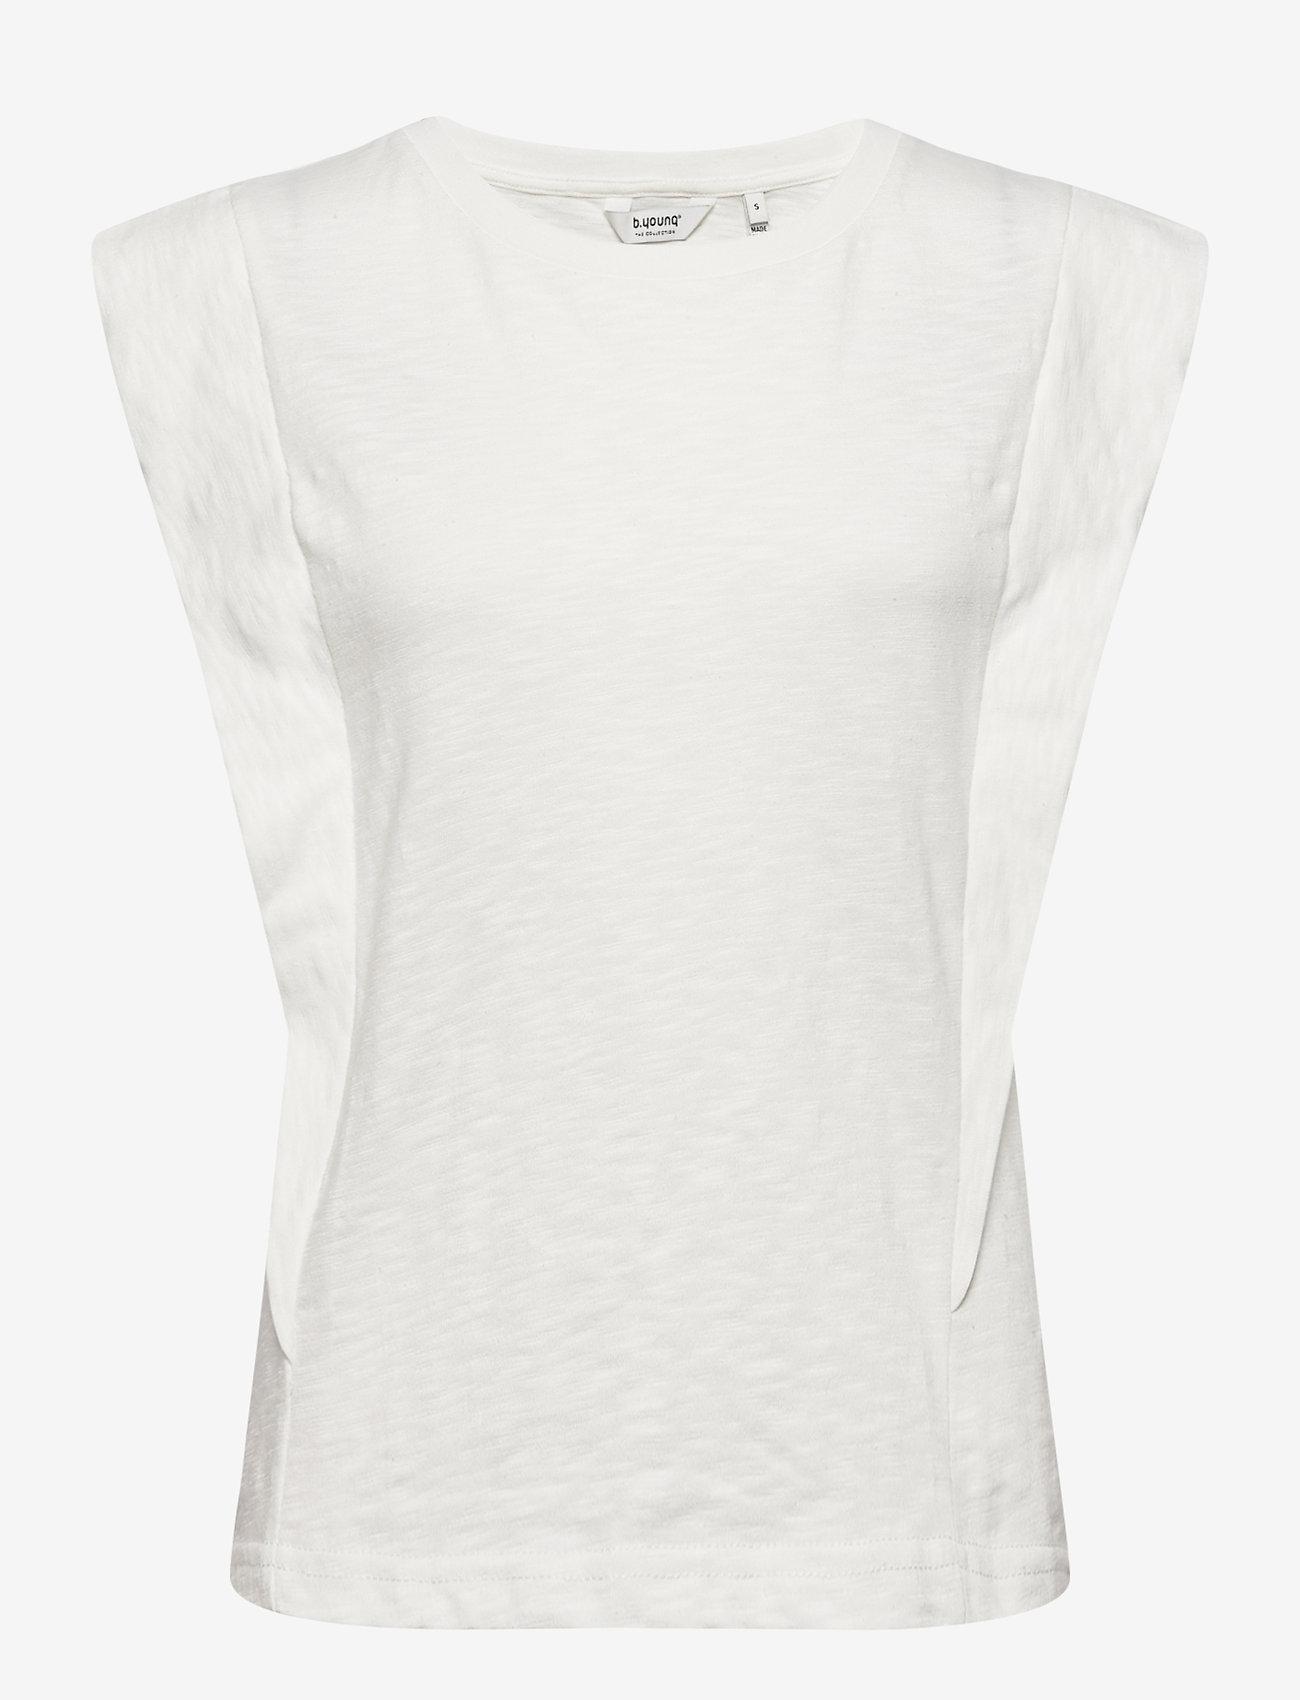 b.young - BYTELLA SLEEVELESS - - sleeveless tops - off white - 0